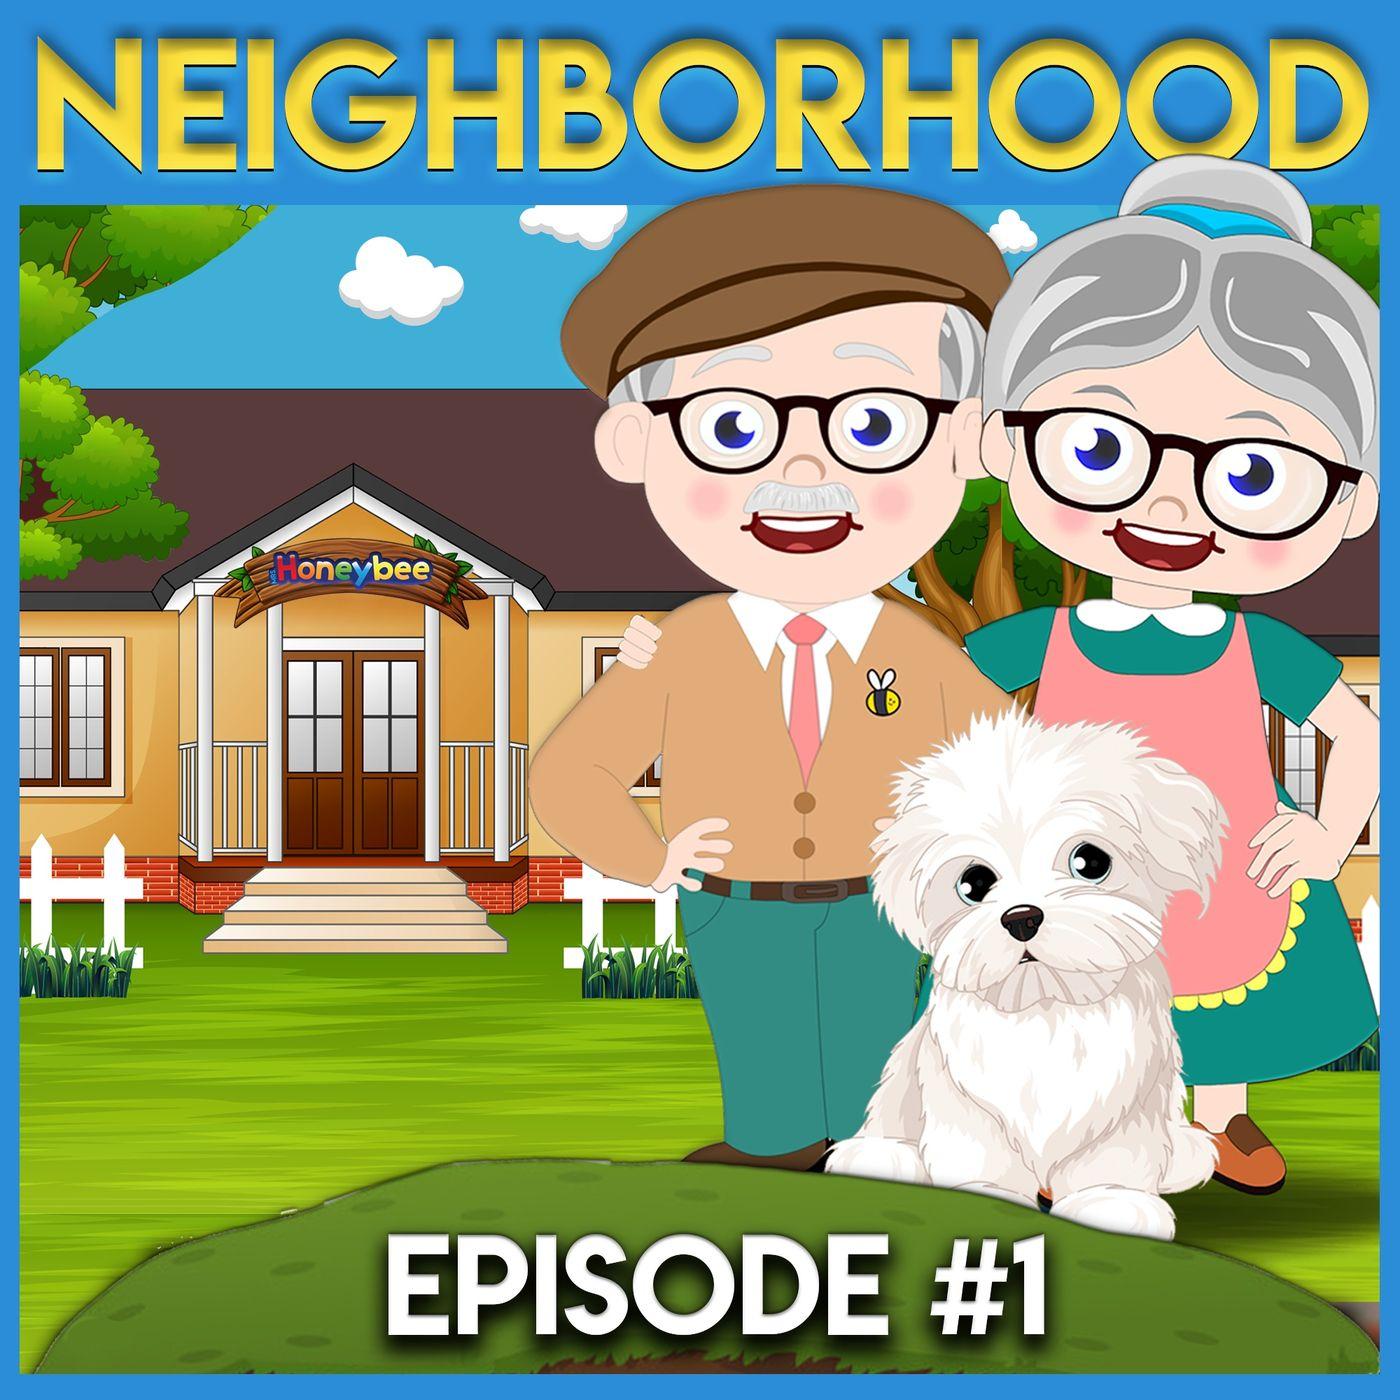 Mrs. Honeybee's Neighborhood - Episode 1